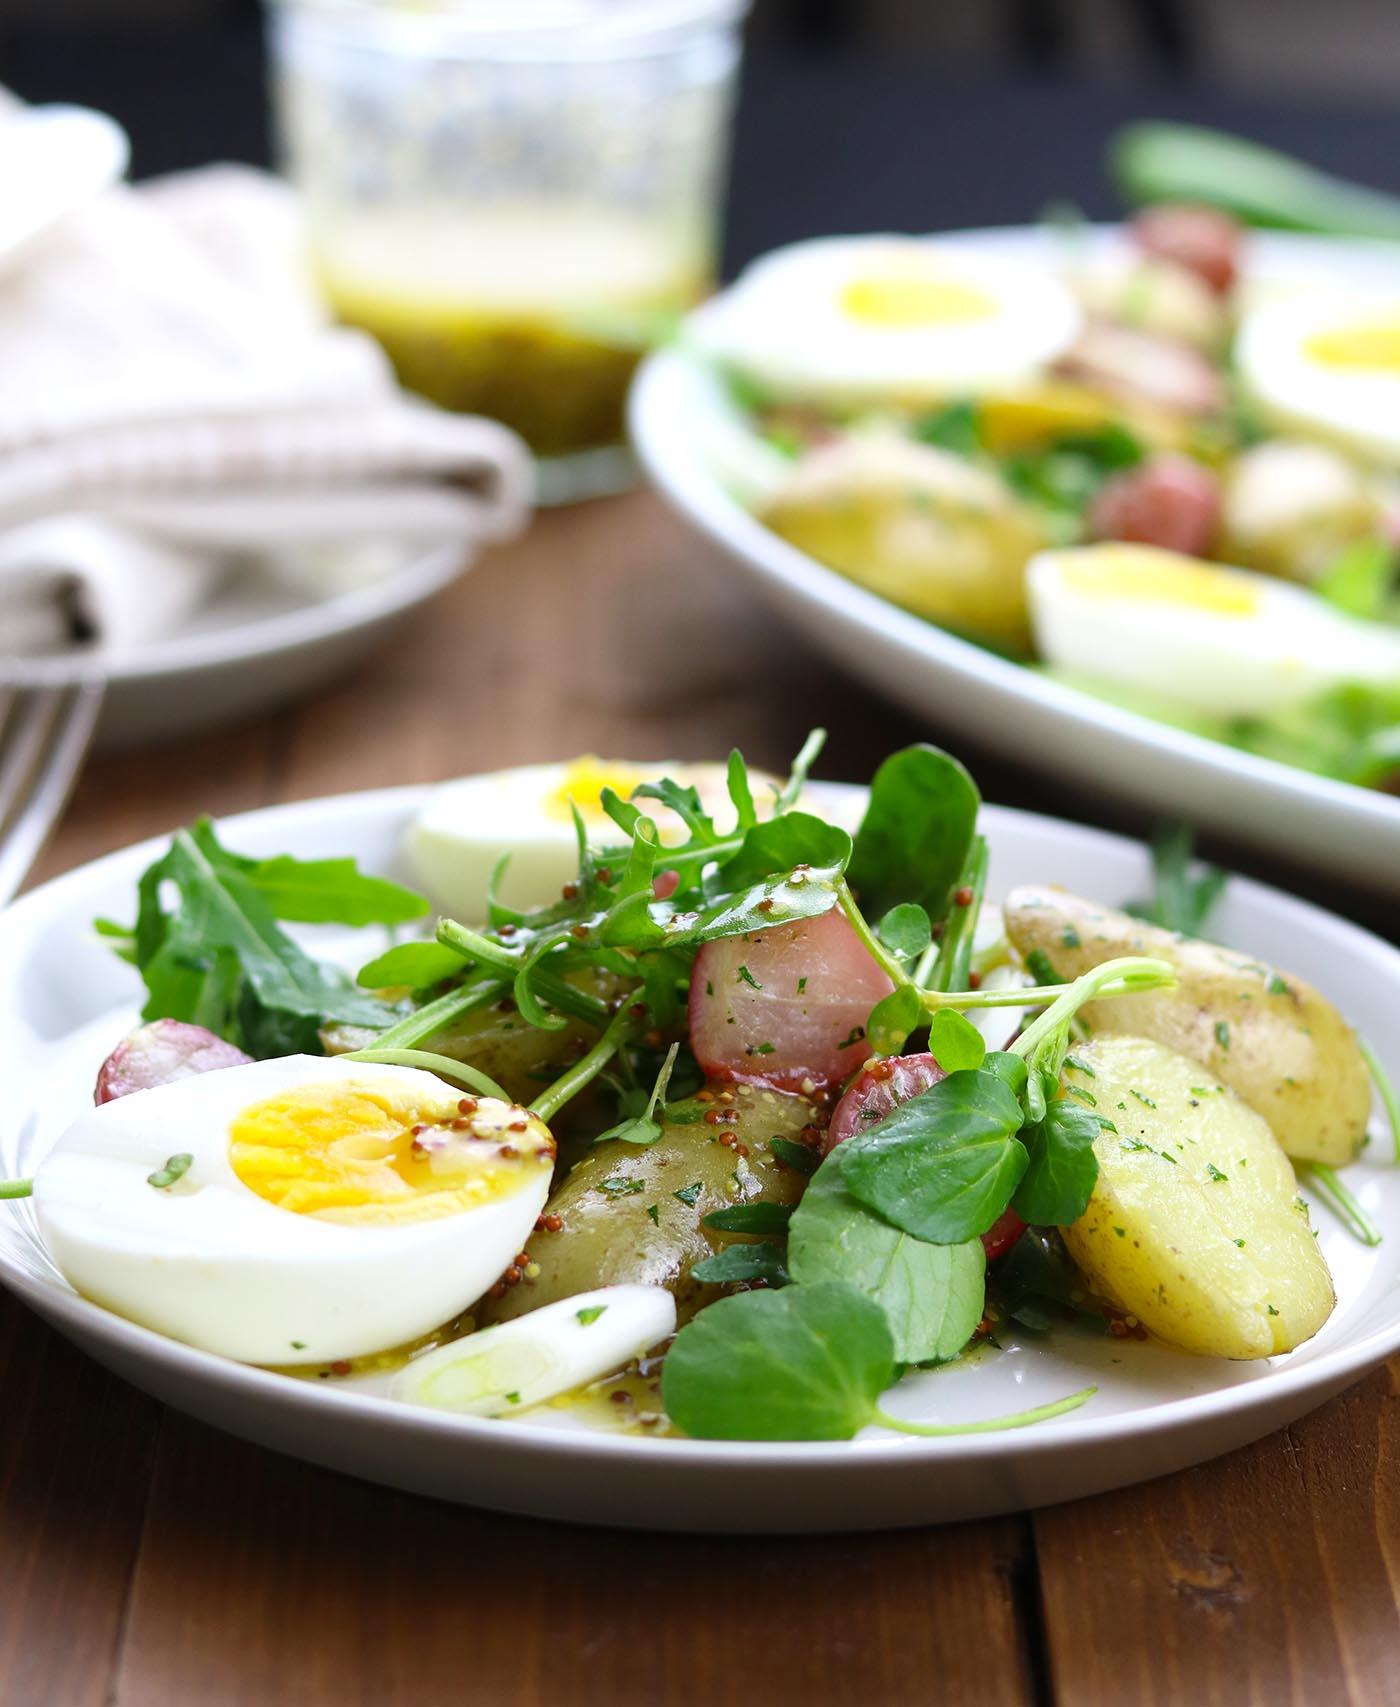 Roasted Radish, Potato & Egg Salad - thelastfoodblog.com